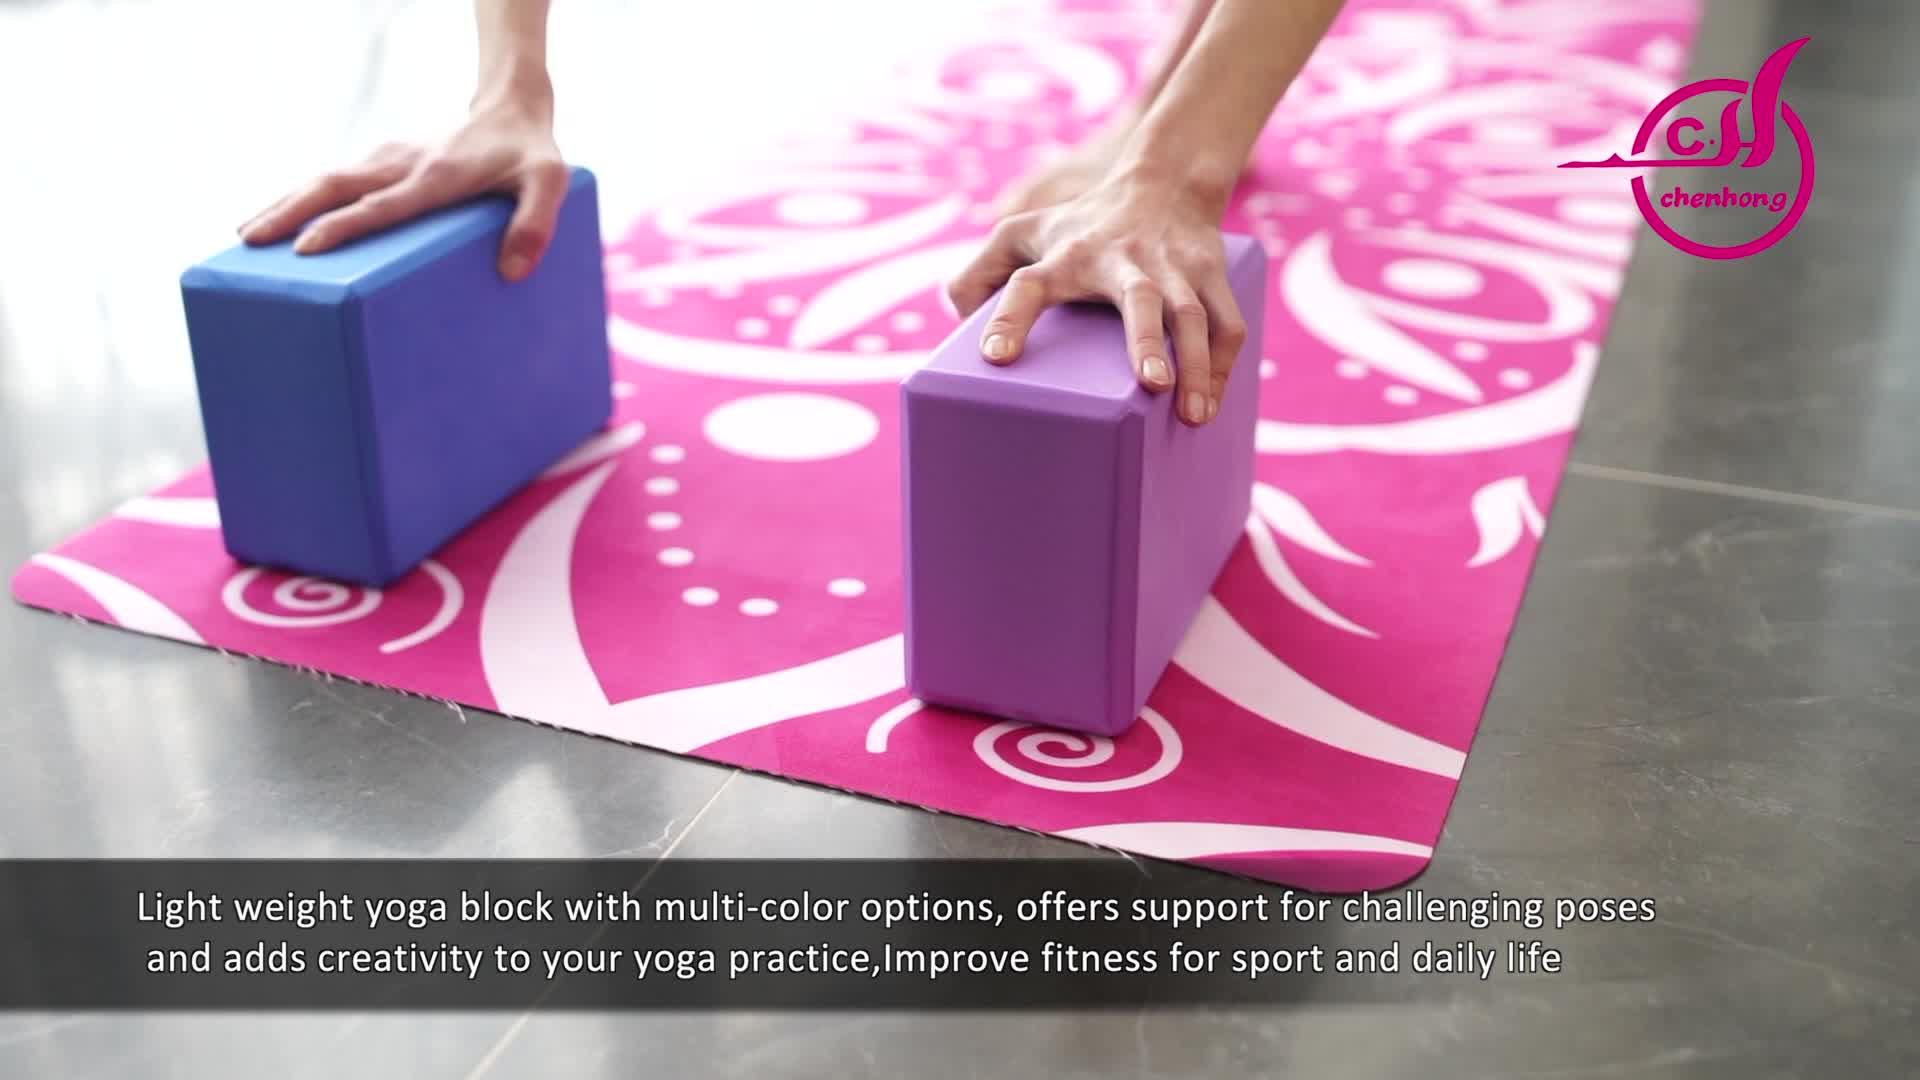 Pelatihan fungsional Kepadatan Tinggi busa eva tidak beracun Lembut yoga blok